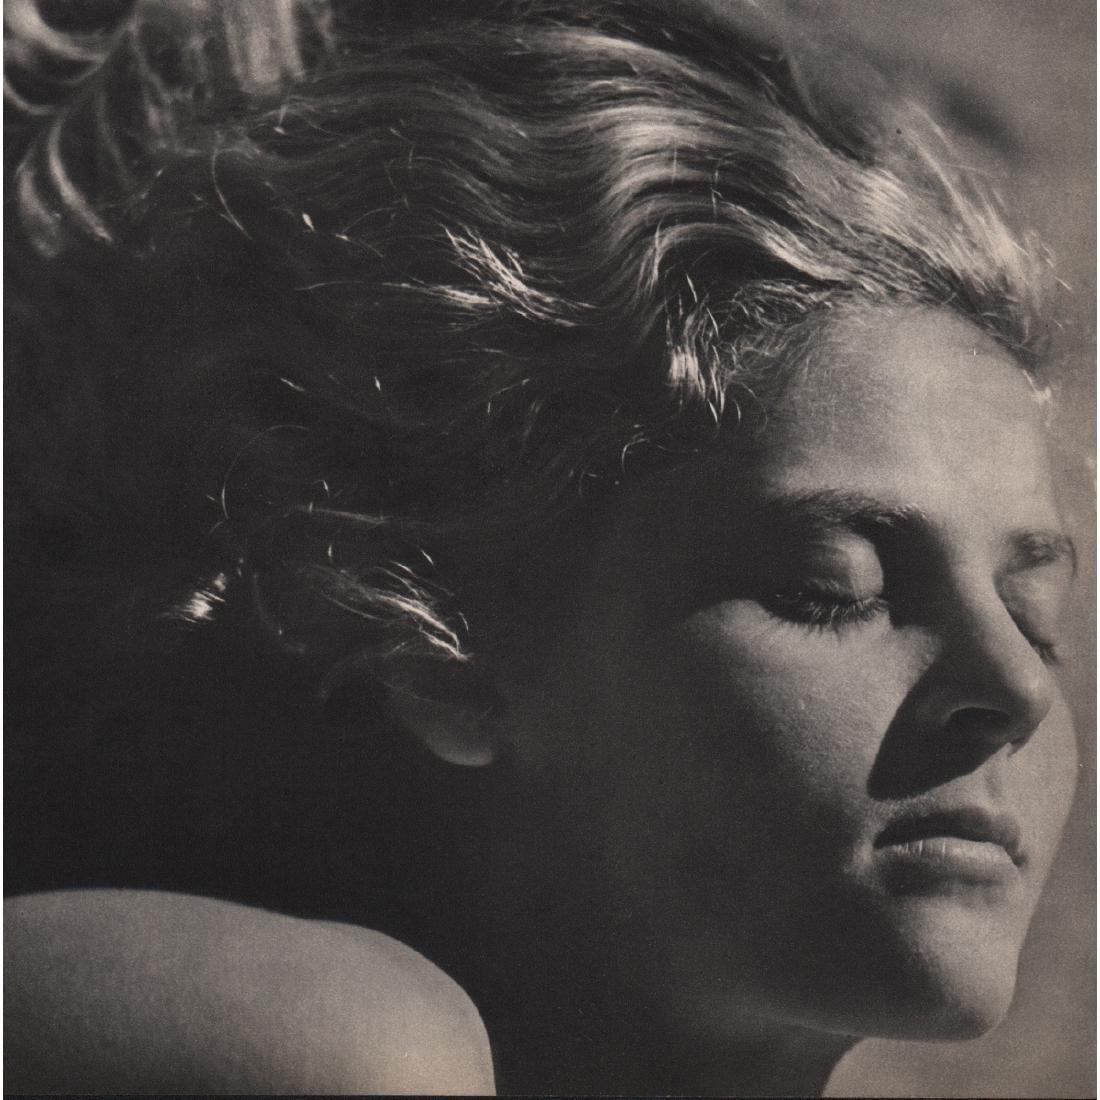 DORA MAAR & KEFER - Portrait